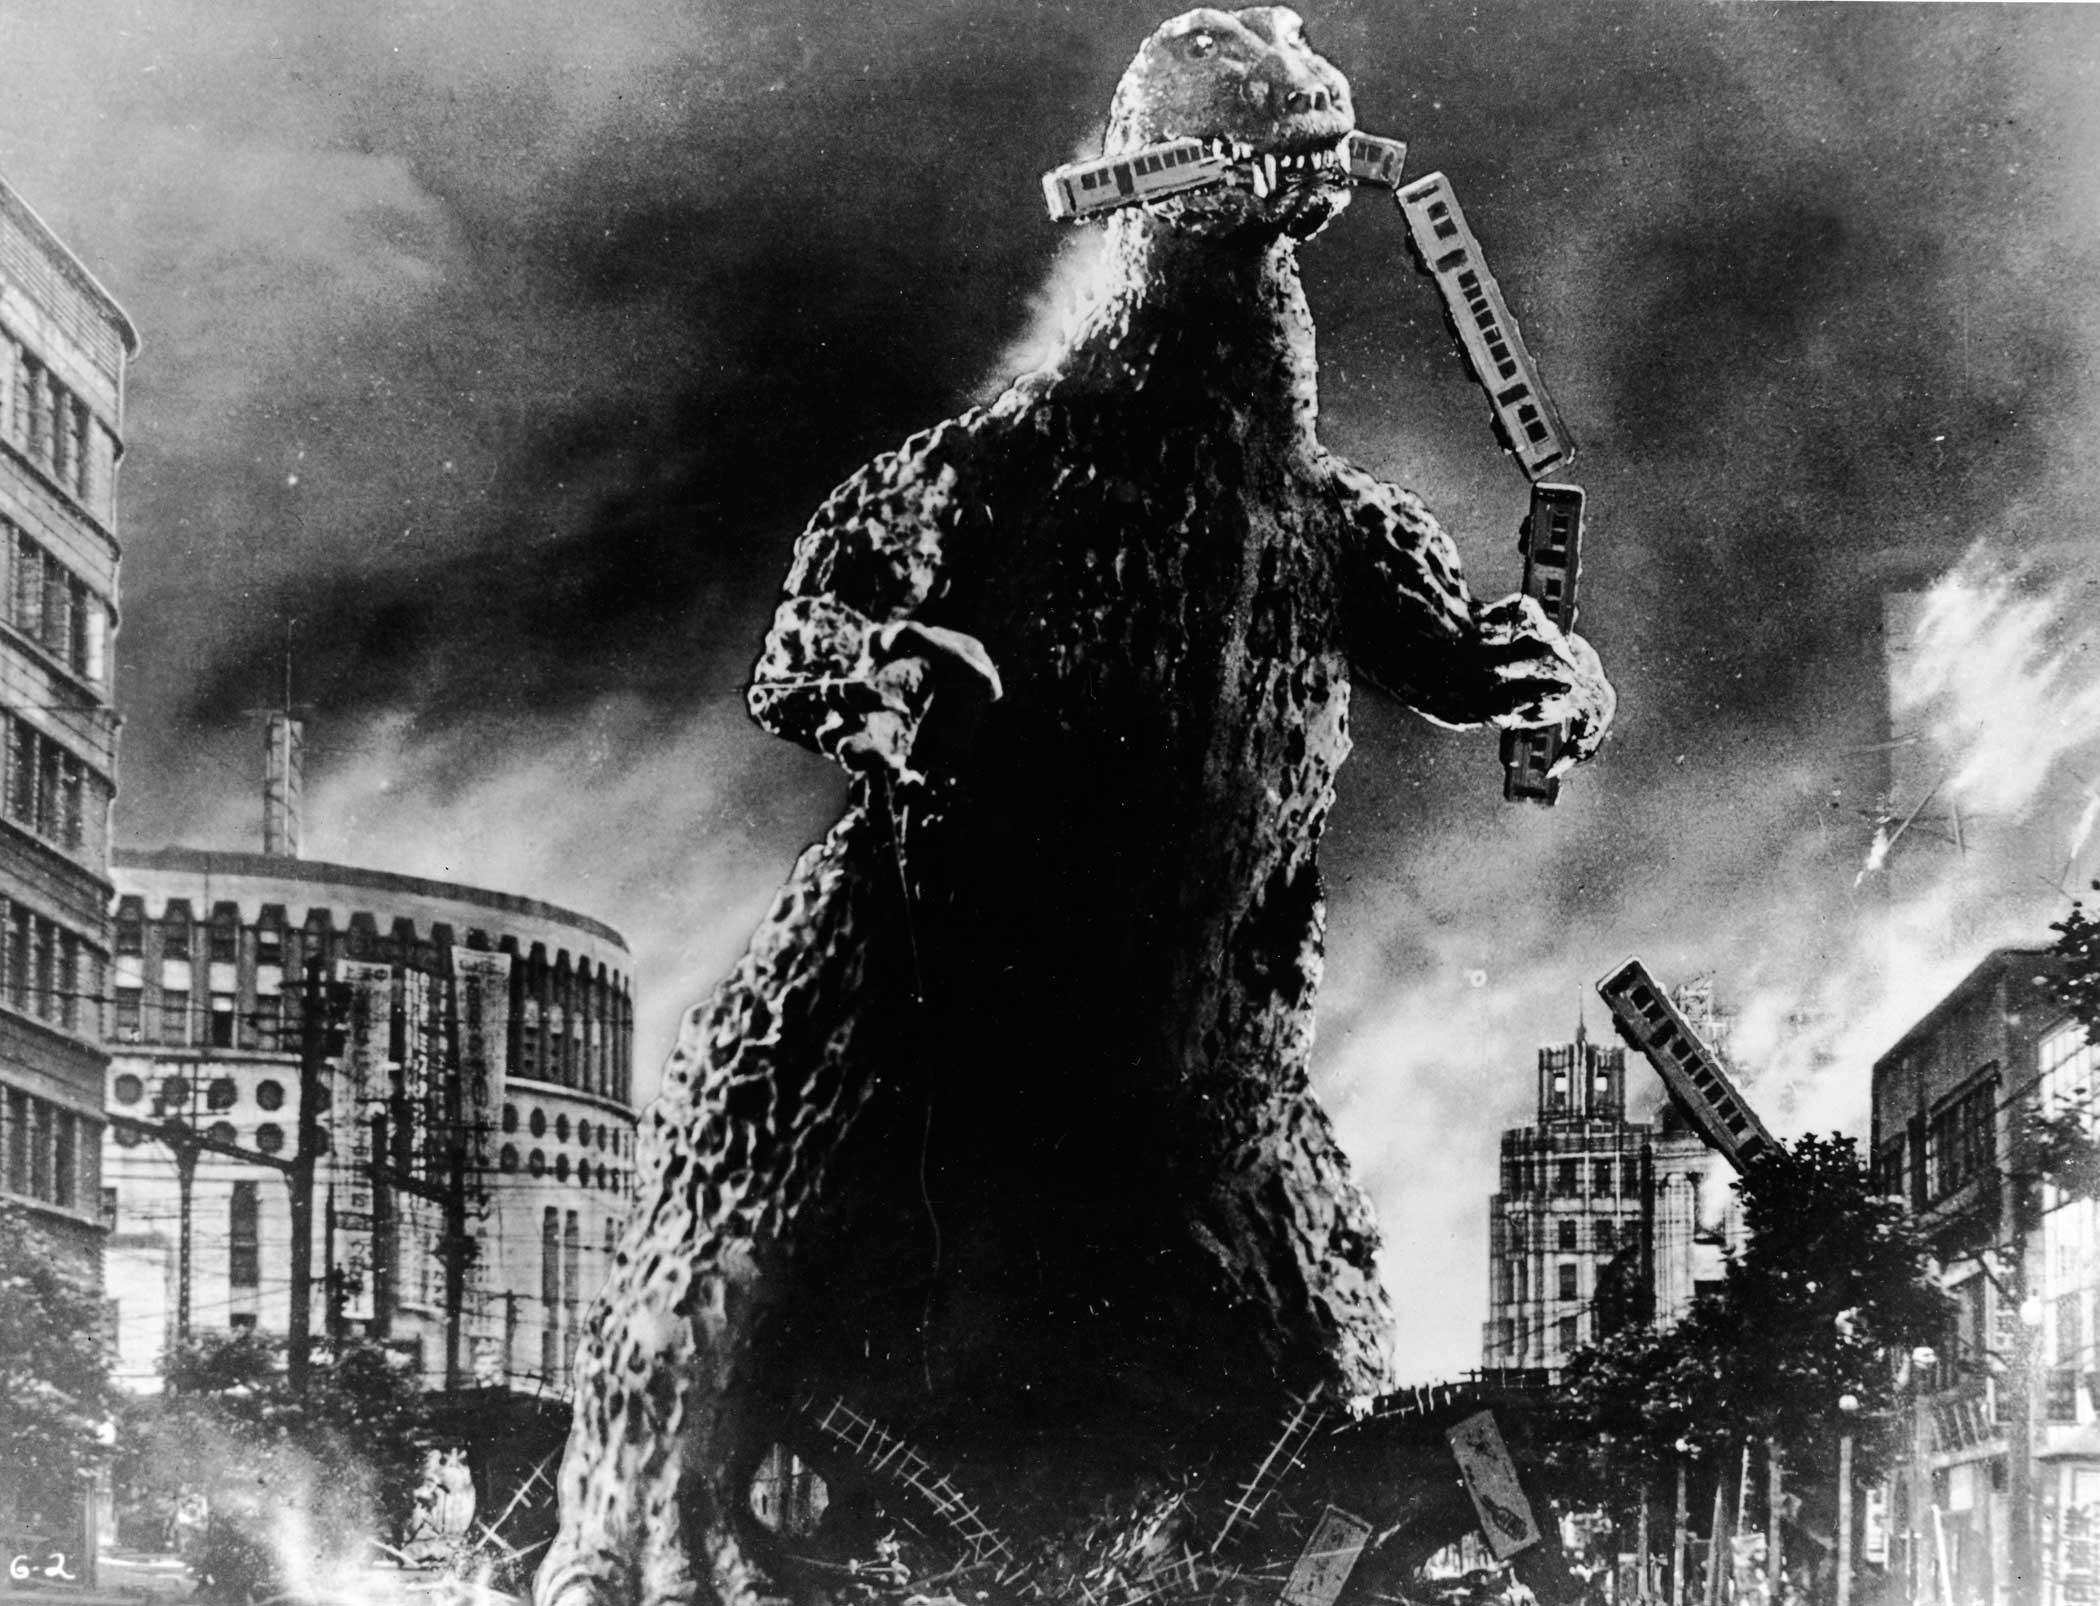 Godzilla from Godzilla, 1954.